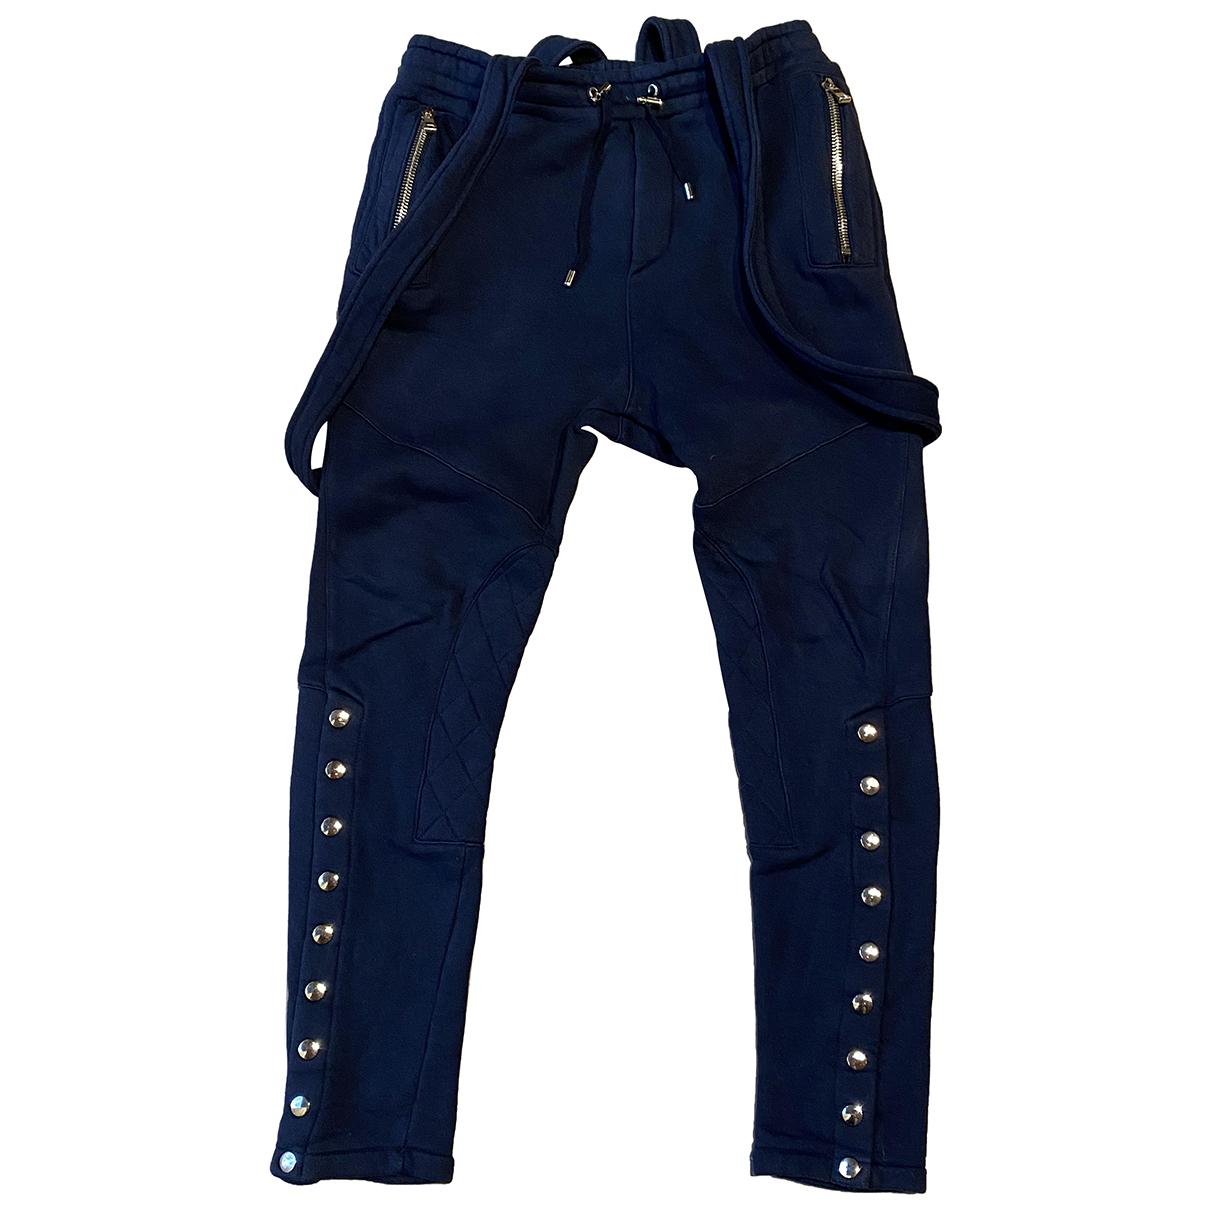 Balmain N Blue Cotton Trousers for Men M International